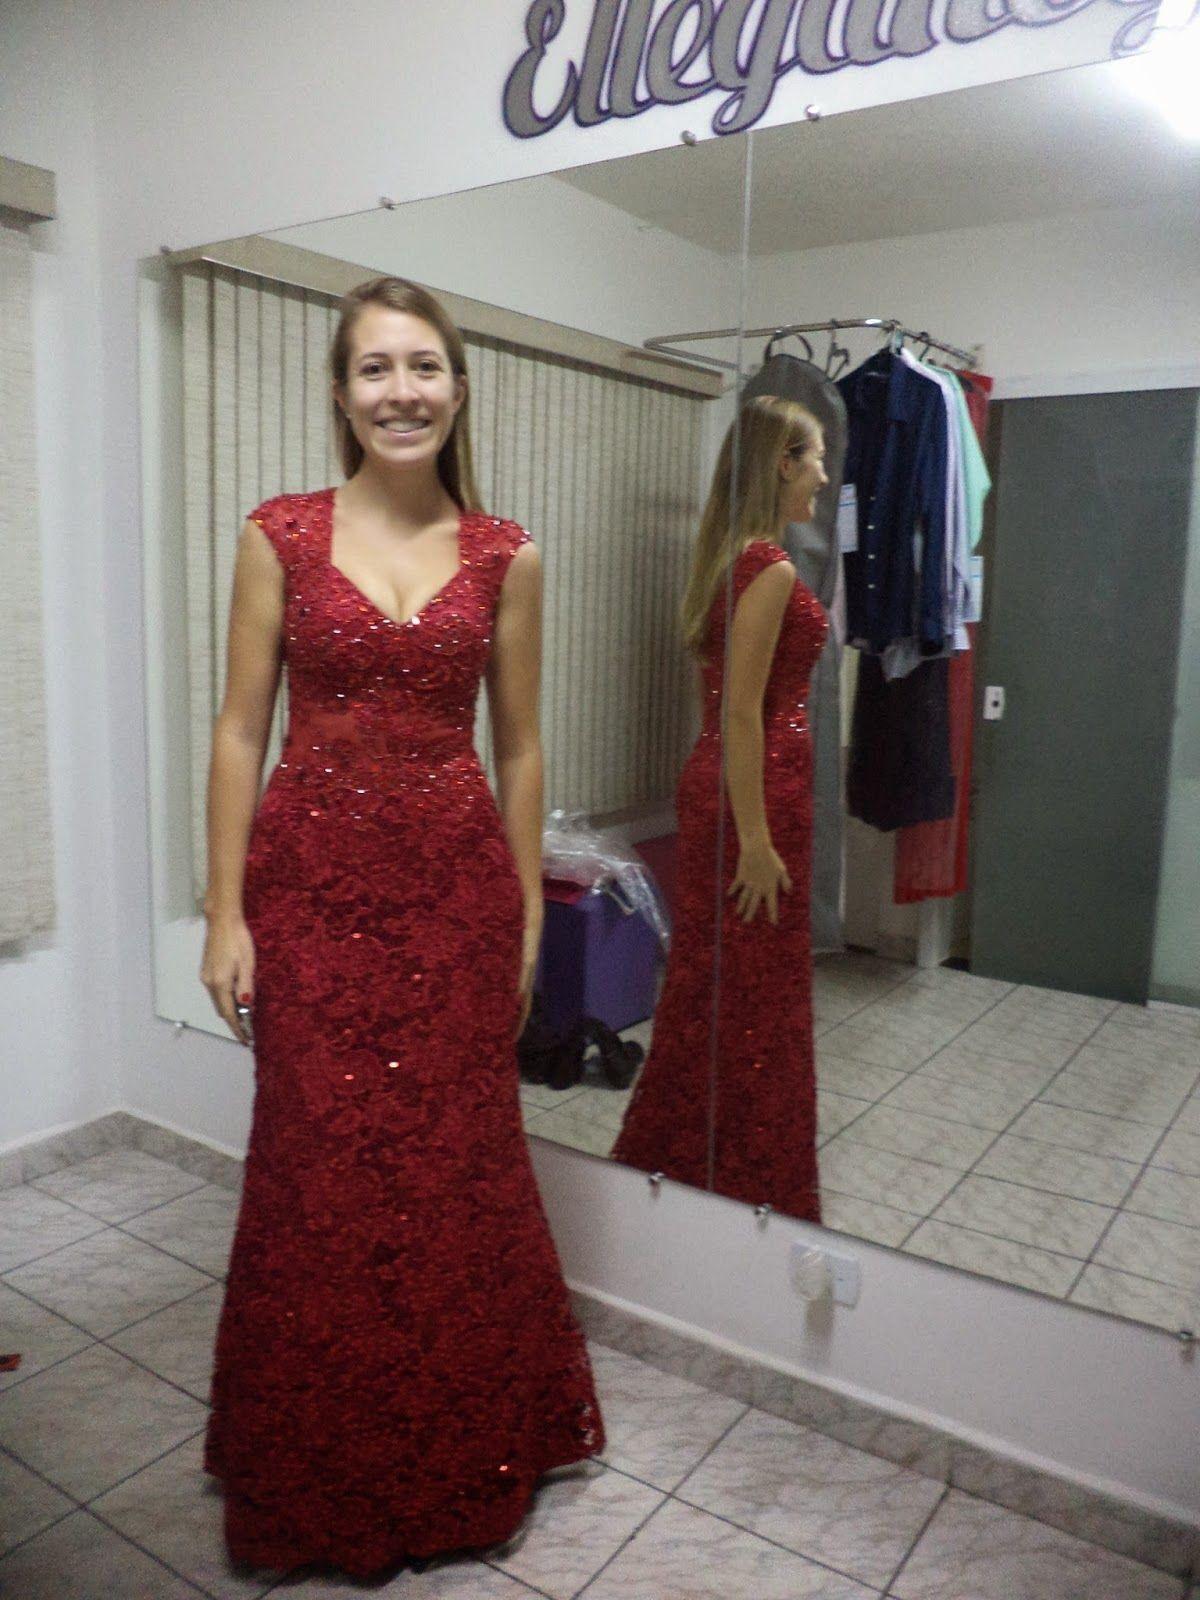 costureira-profissional-para-ajustar-roupa-4-4652827